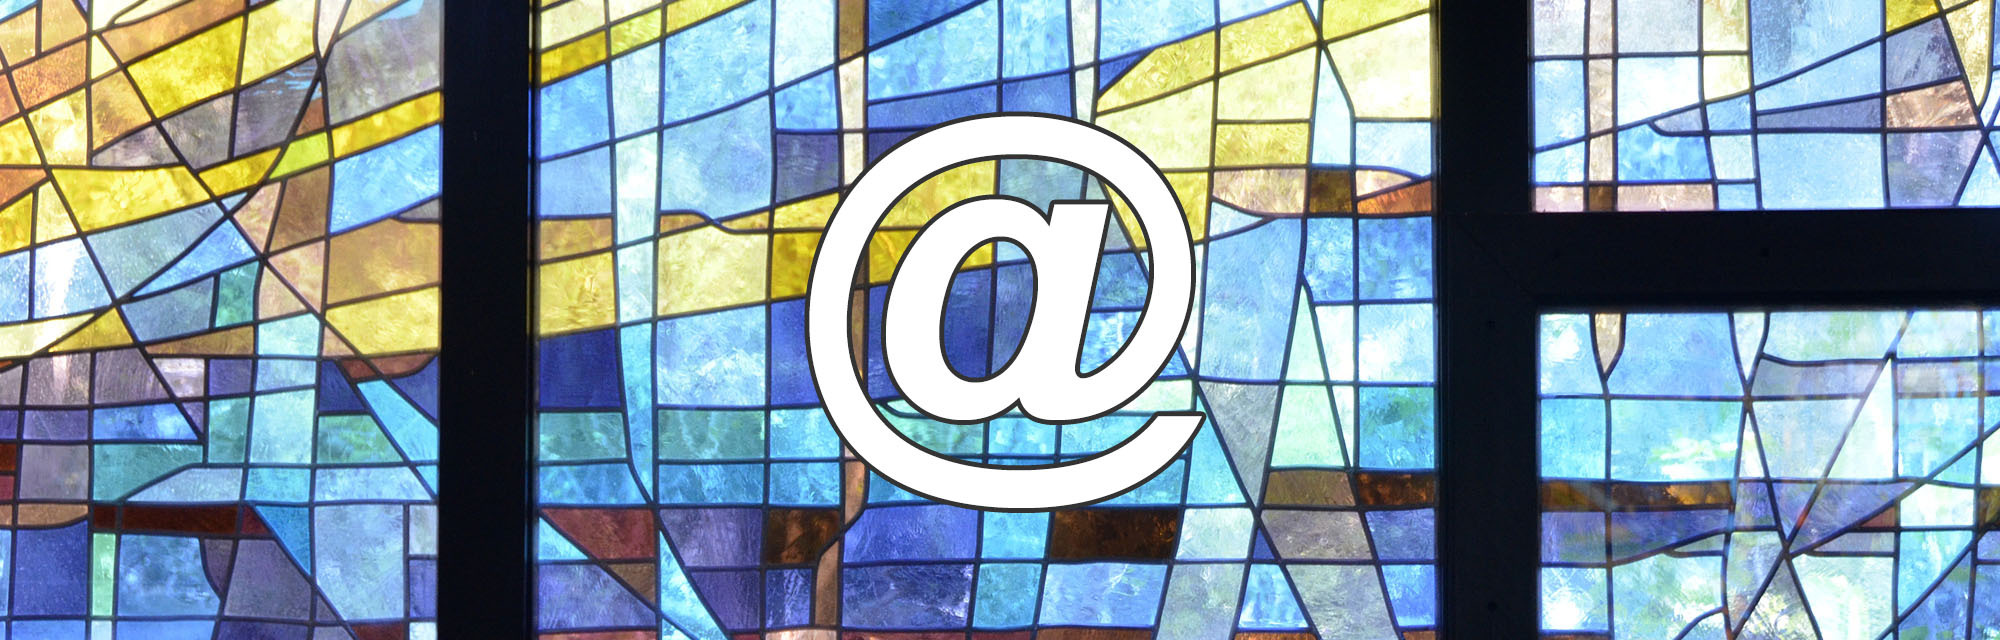 Church email